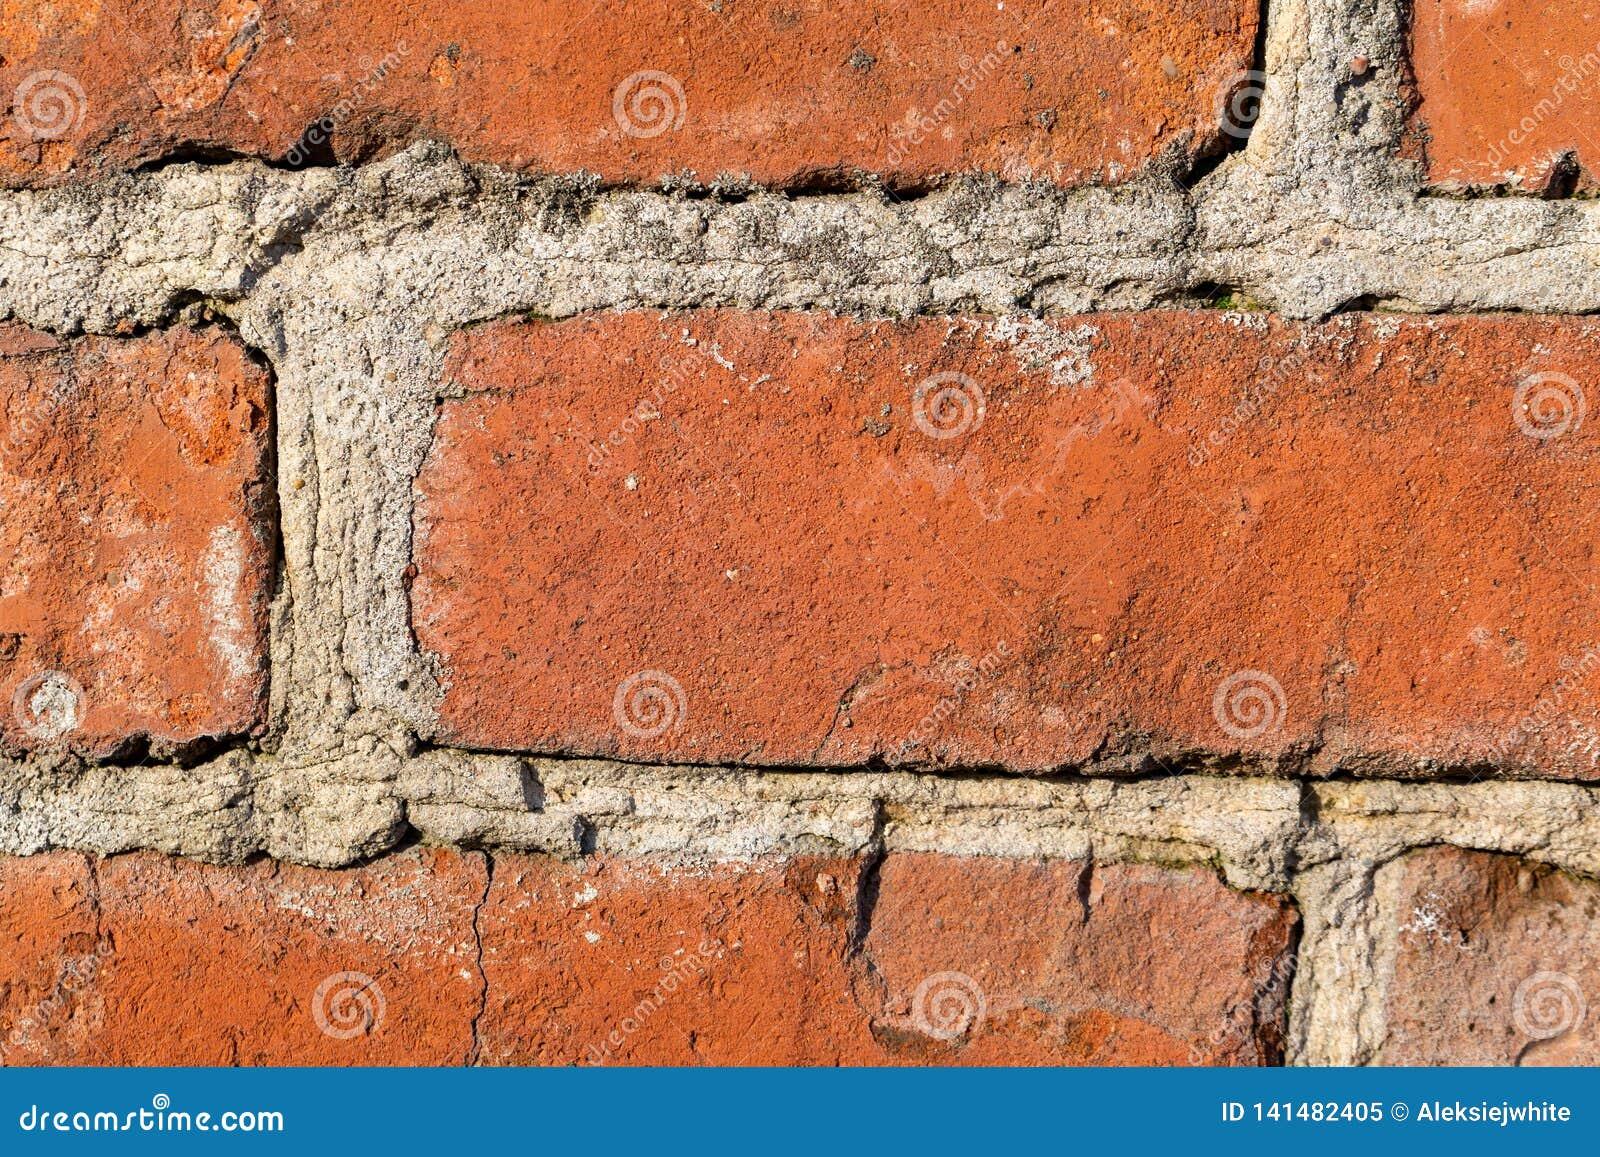 Old big bricks wall background